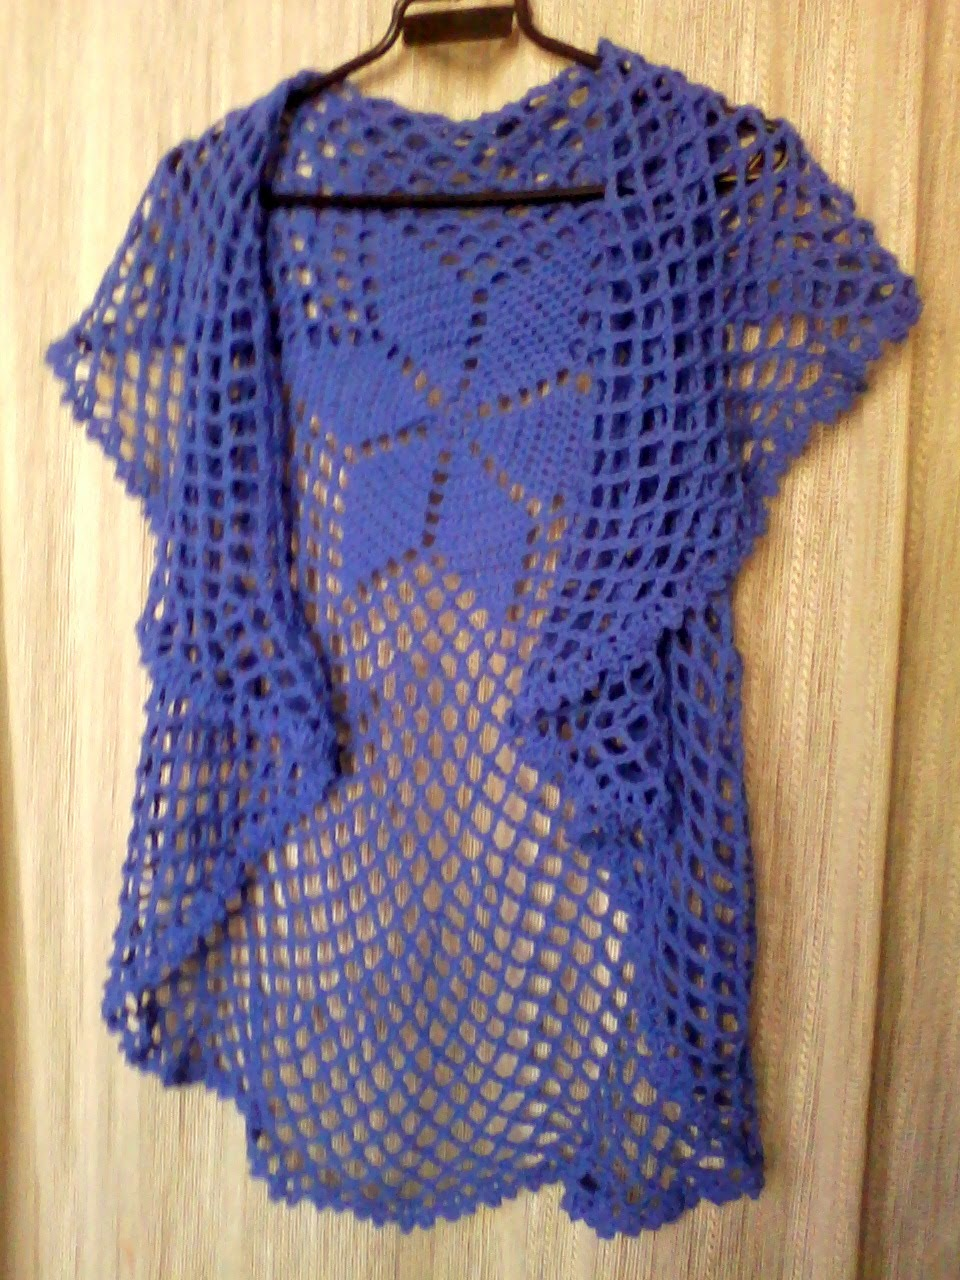 Chaleco circular tejido a crochet